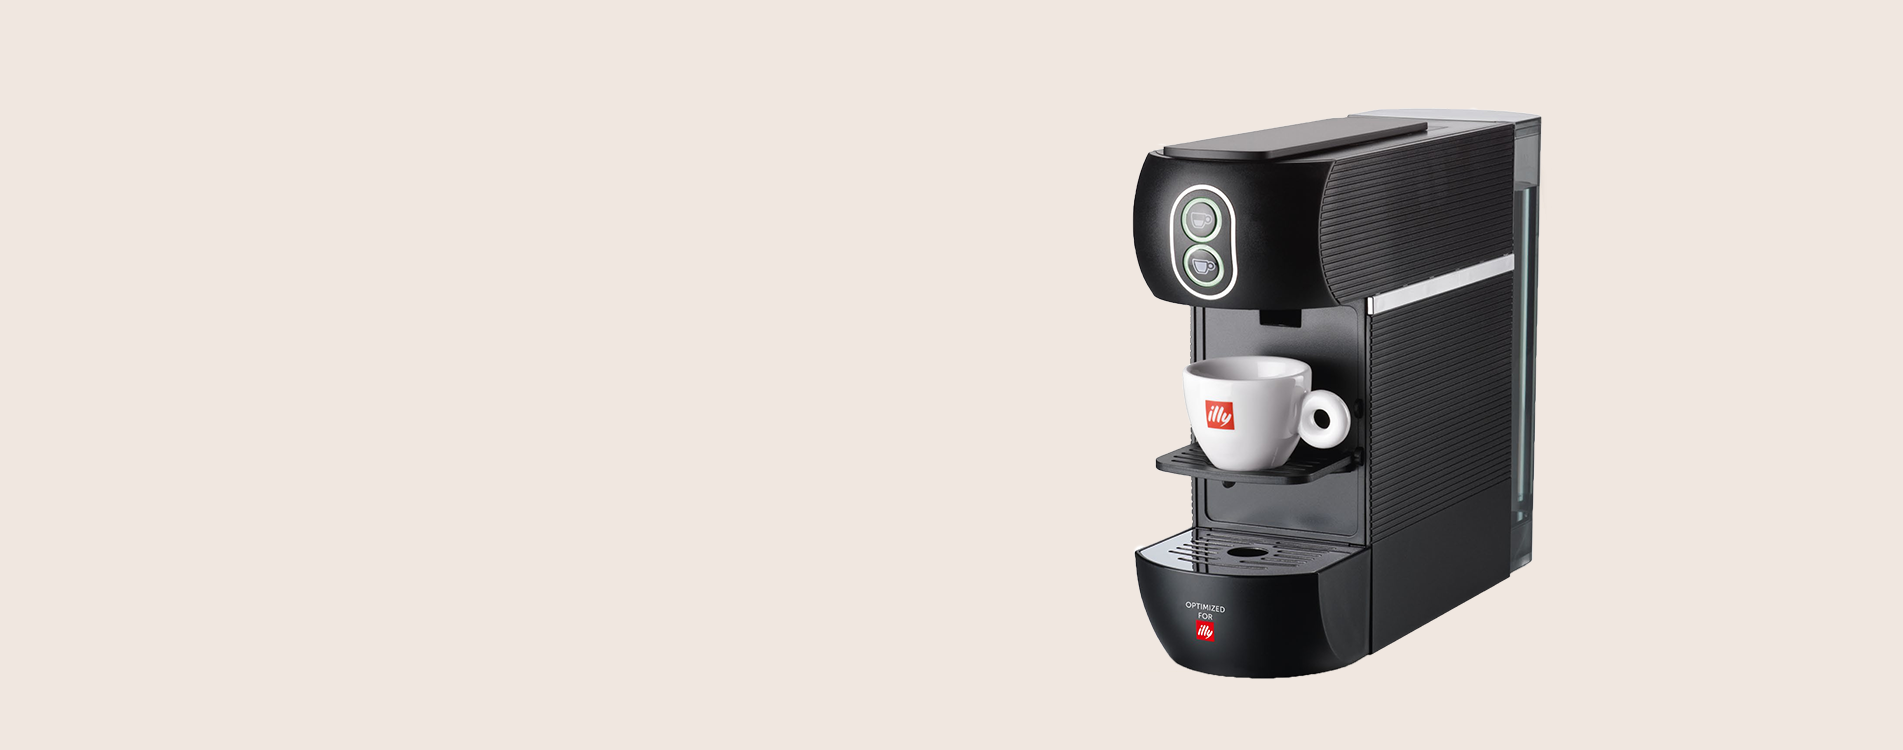 Y3 Iperespresso - Espresso & Coffee rouge